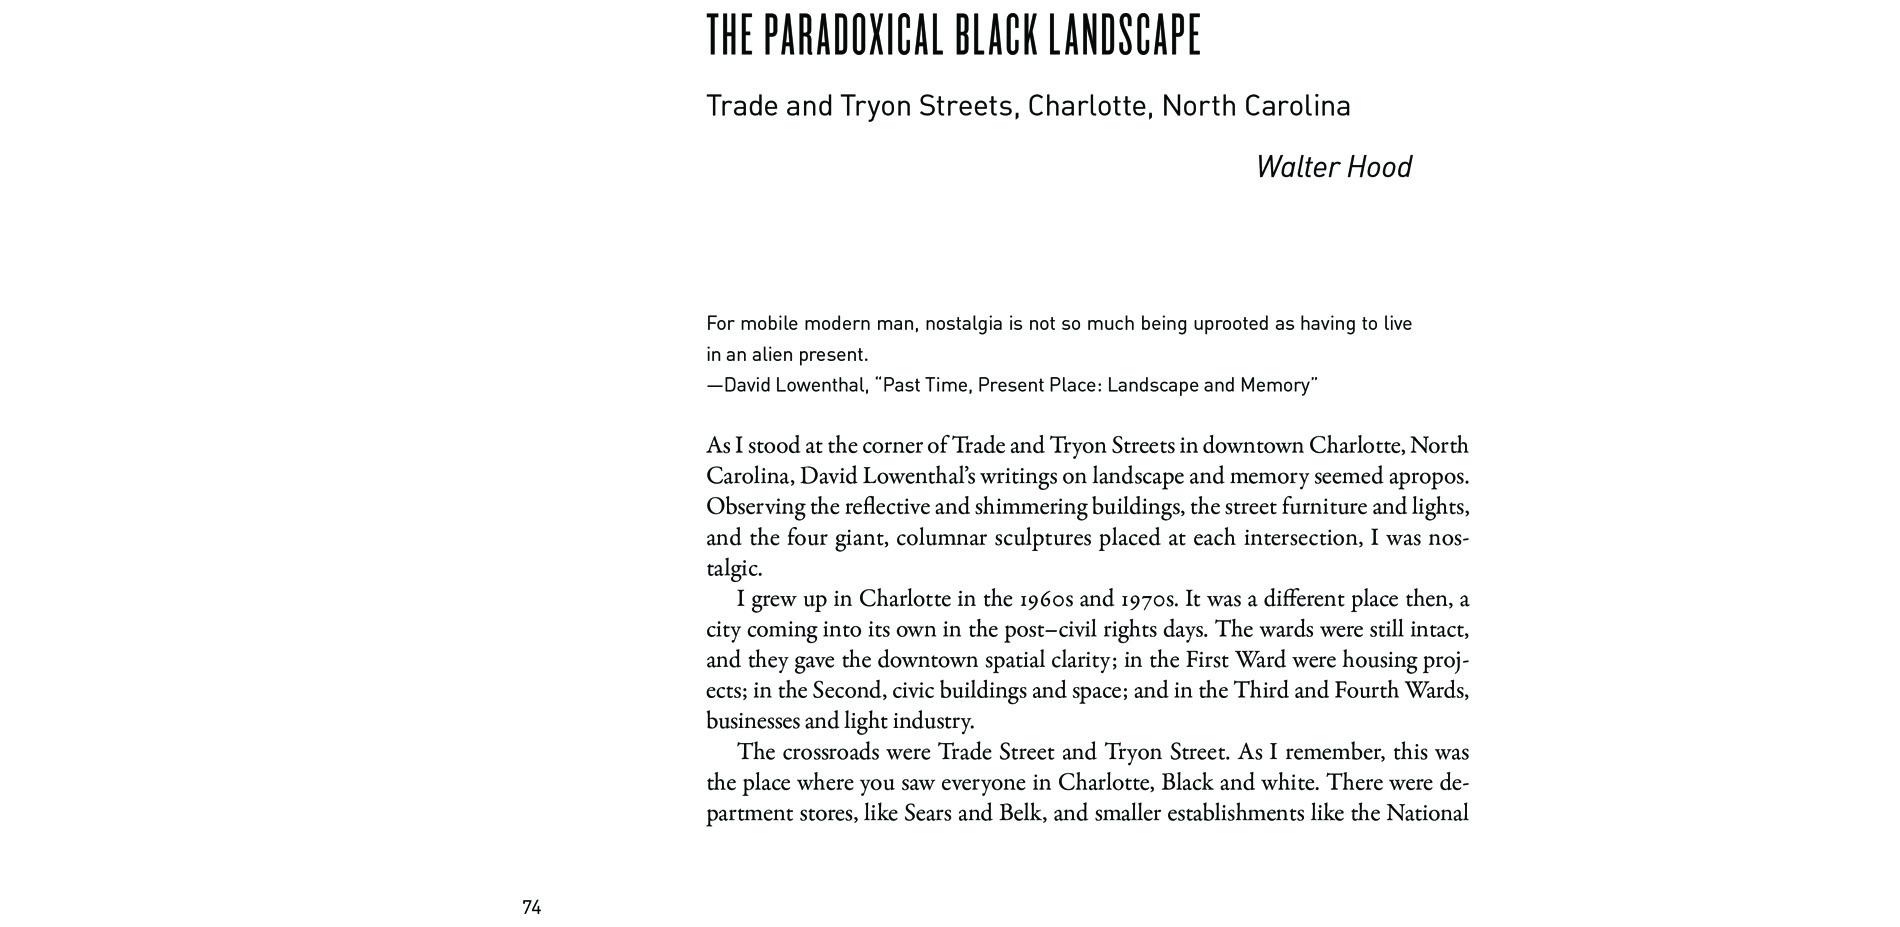 Black Landscapes Matter, The Paradoxical Black Landscape: Trade and Tryon Streets, Charlotte, North Carolina (pg. 74)